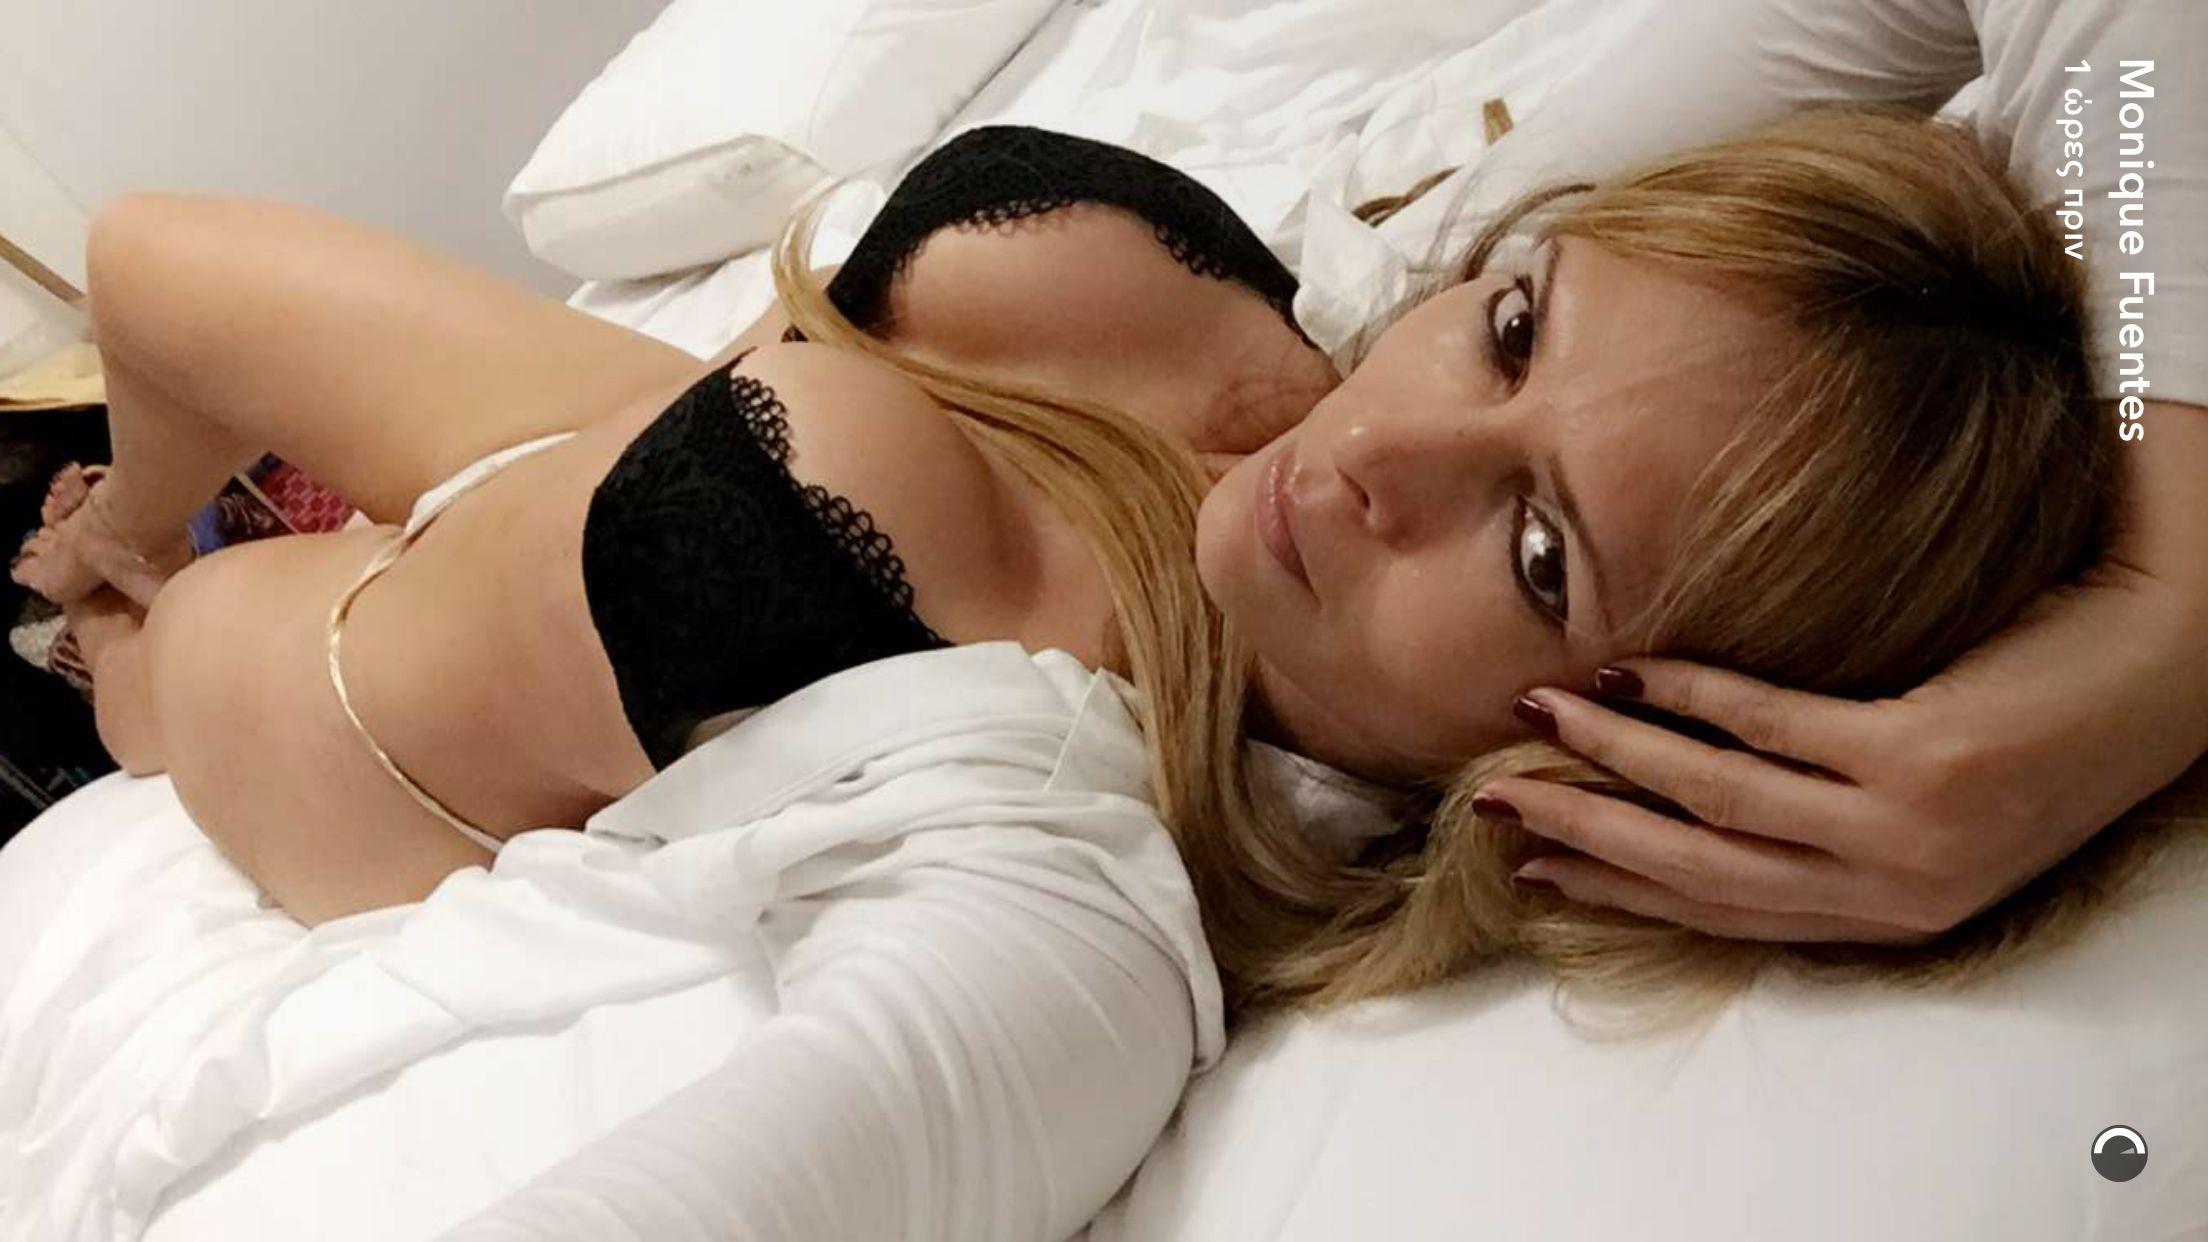 Hot women losing virginity